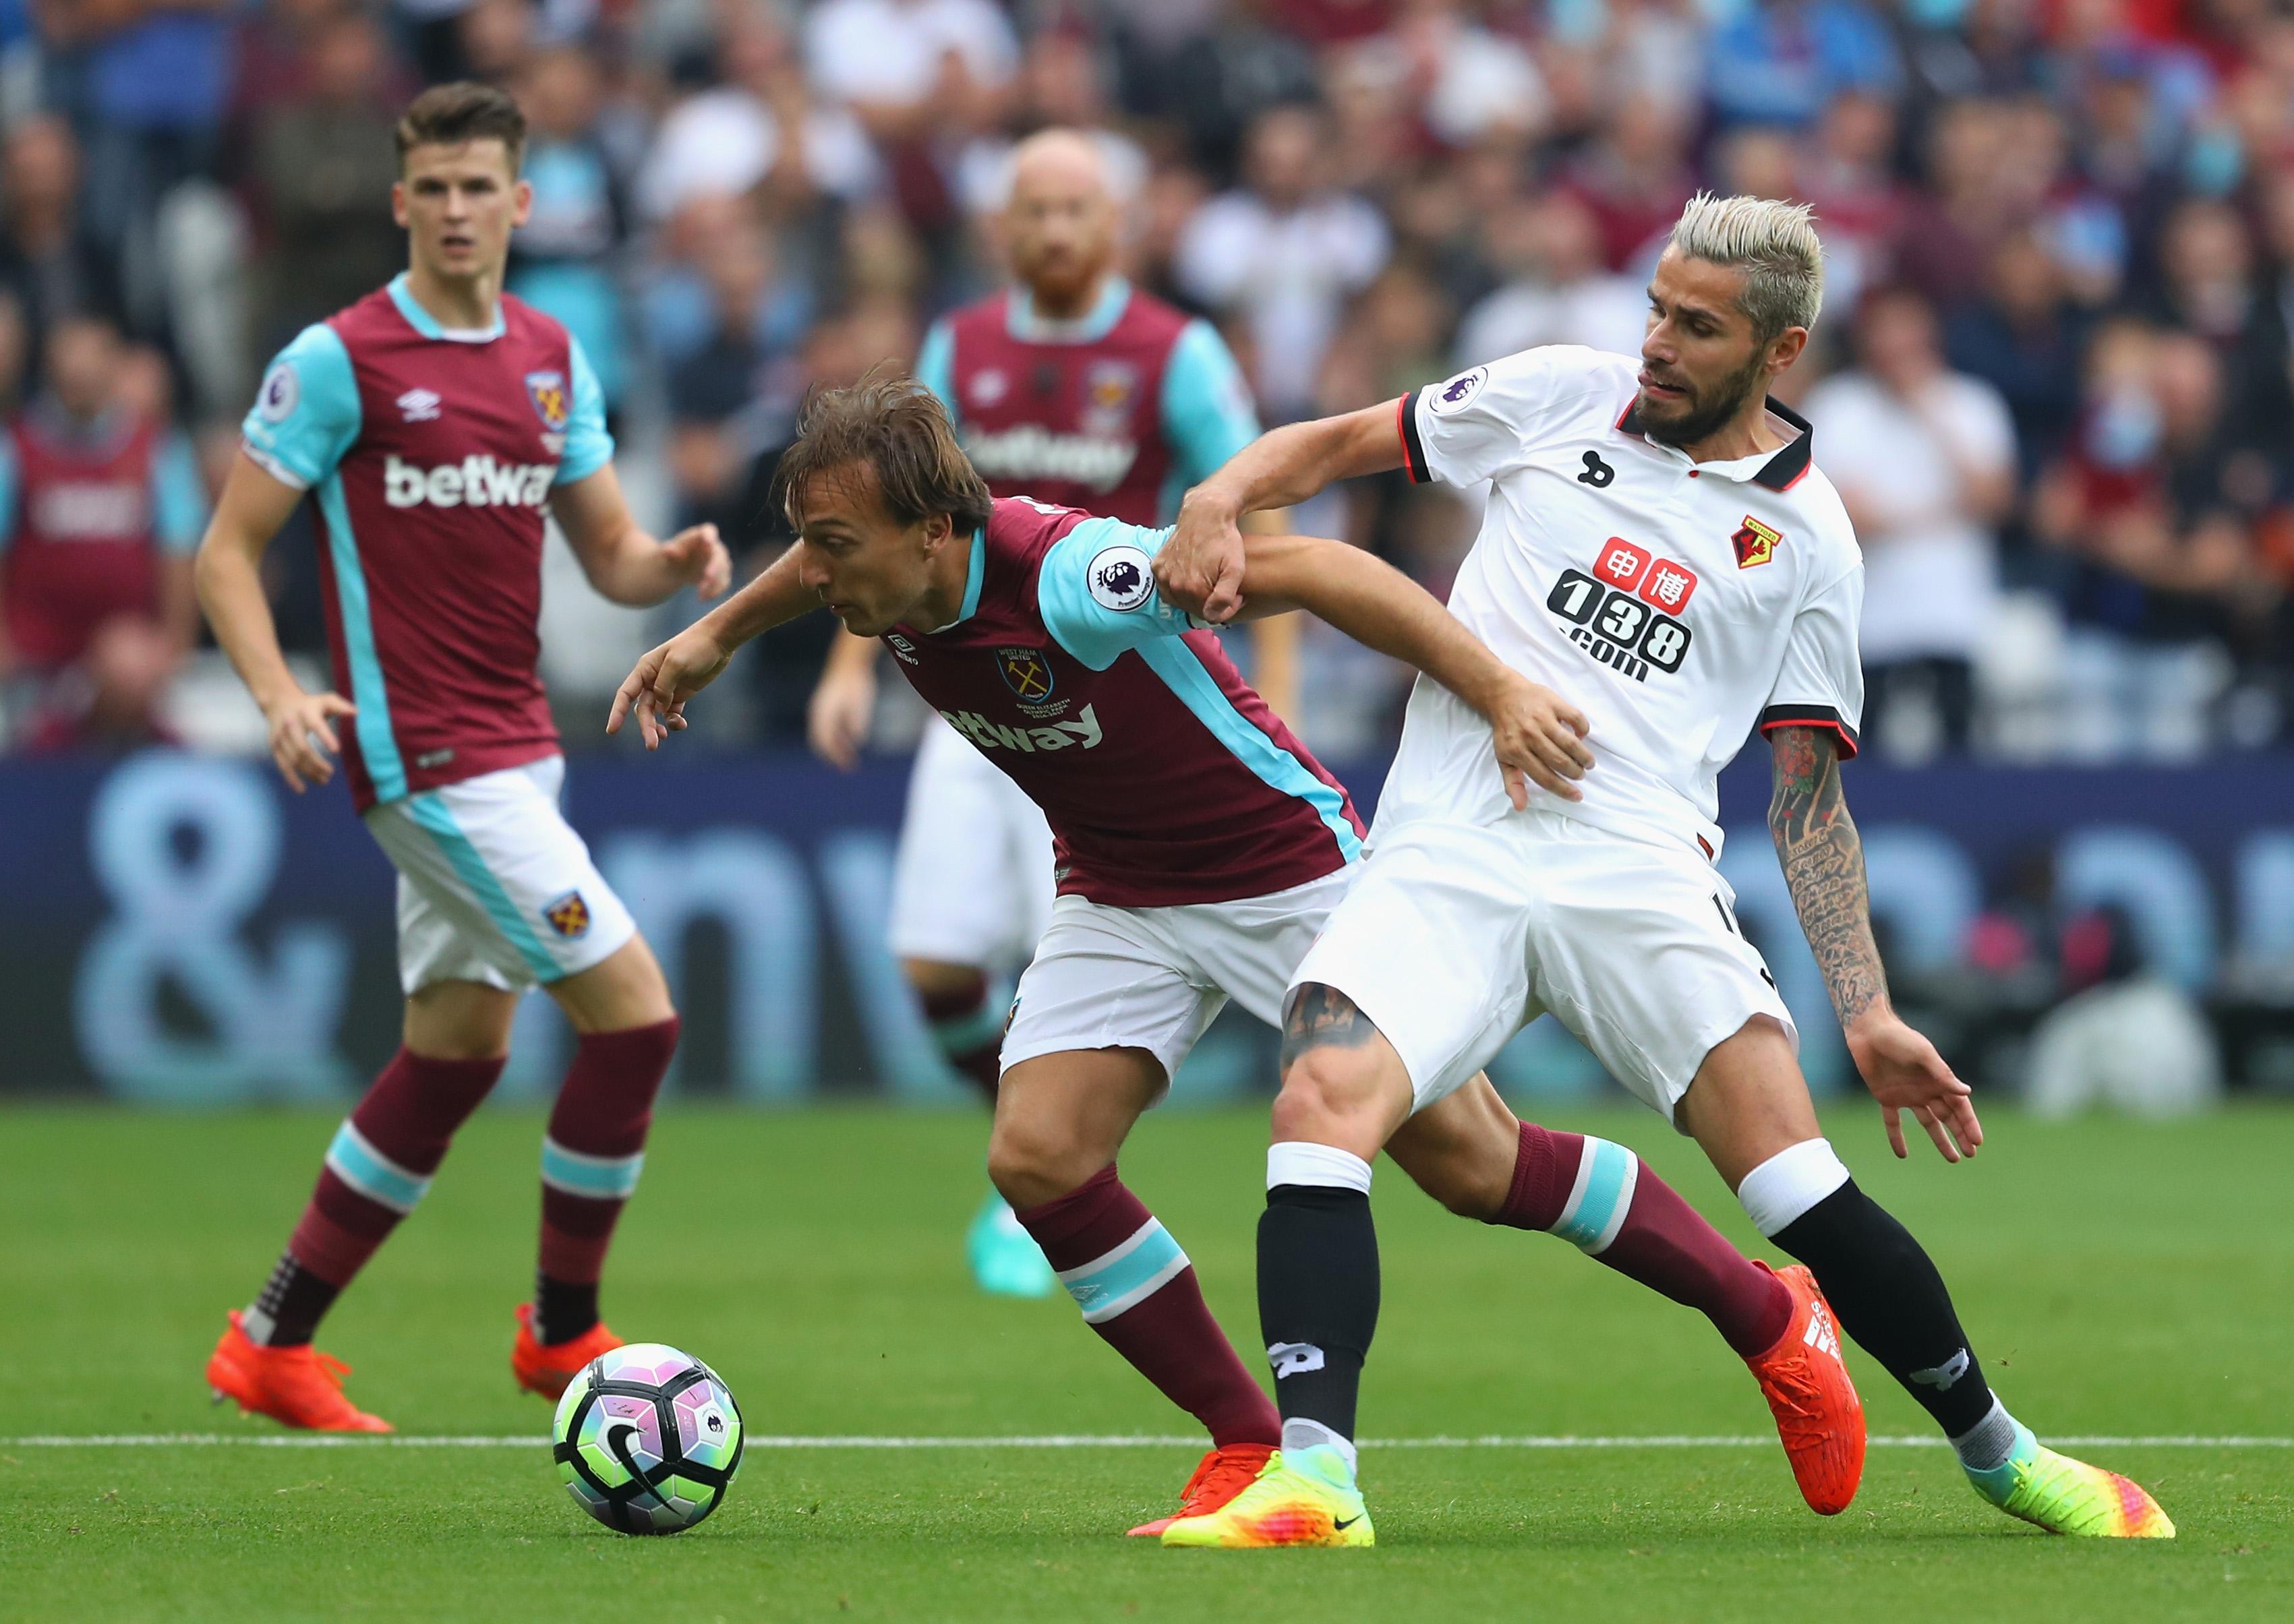 West Ham must drop Mark Noble